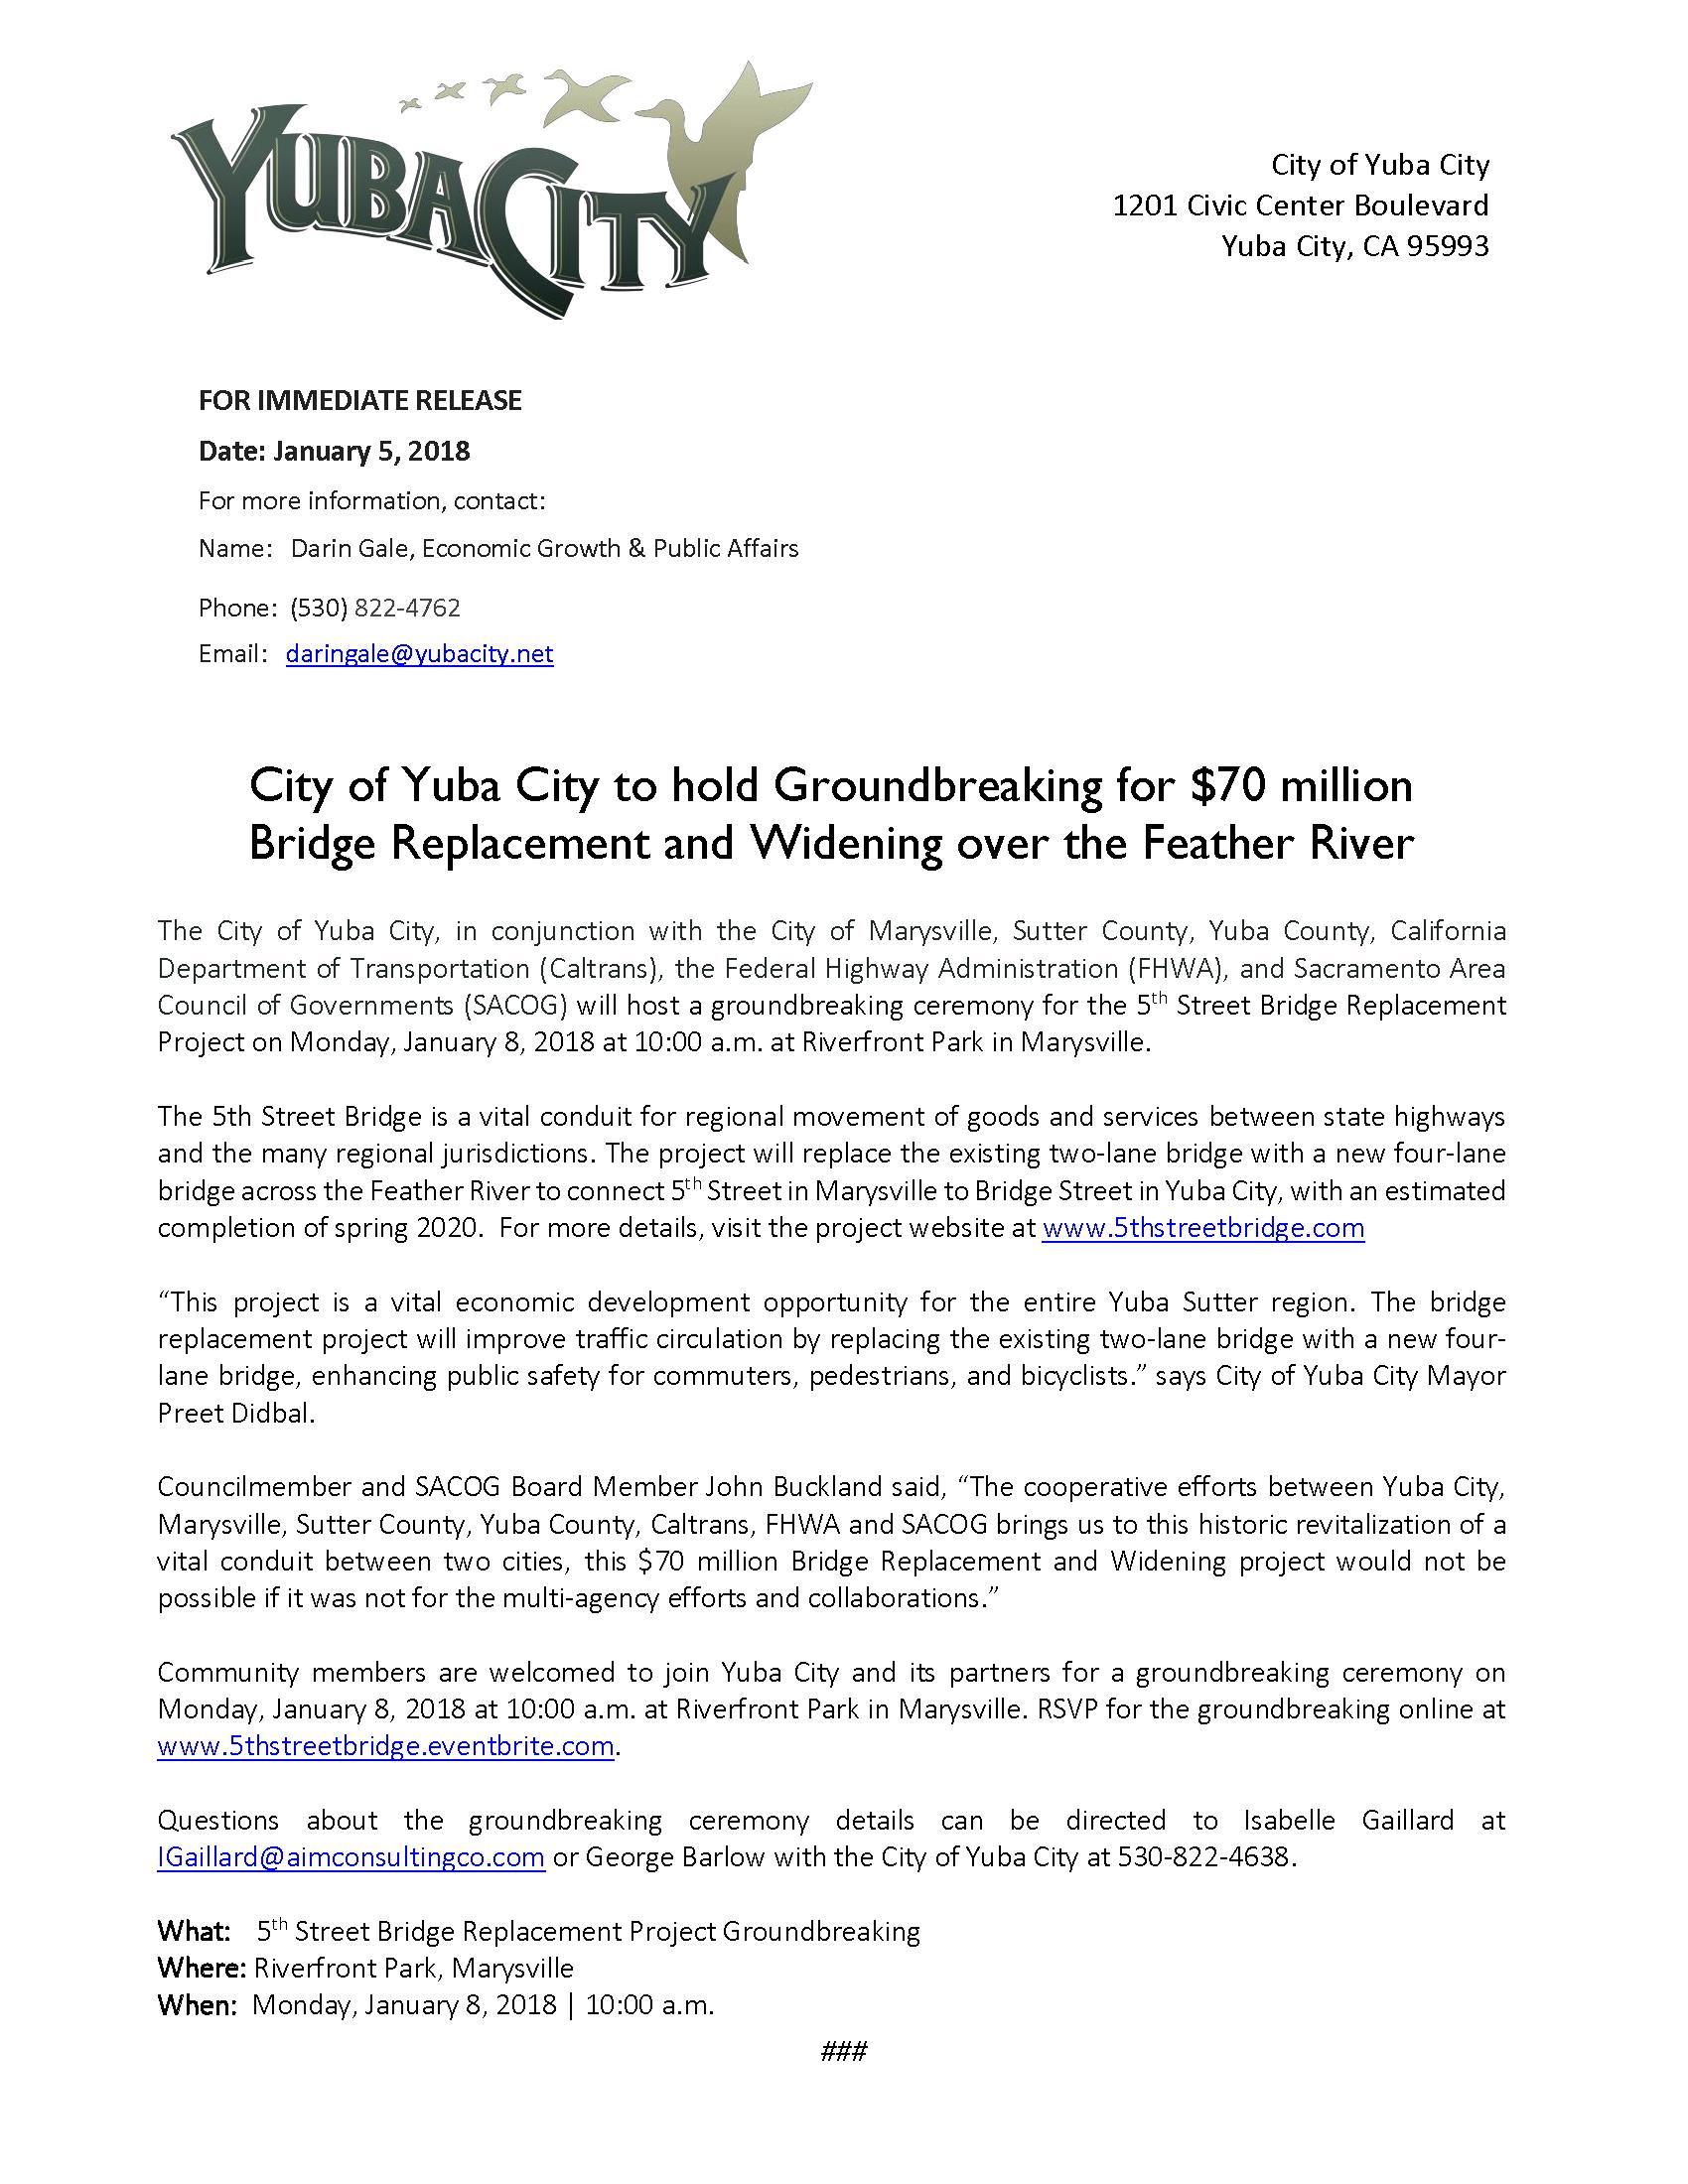 Press Release - 5th St Bridge Groundbreaking 1-5-18.png